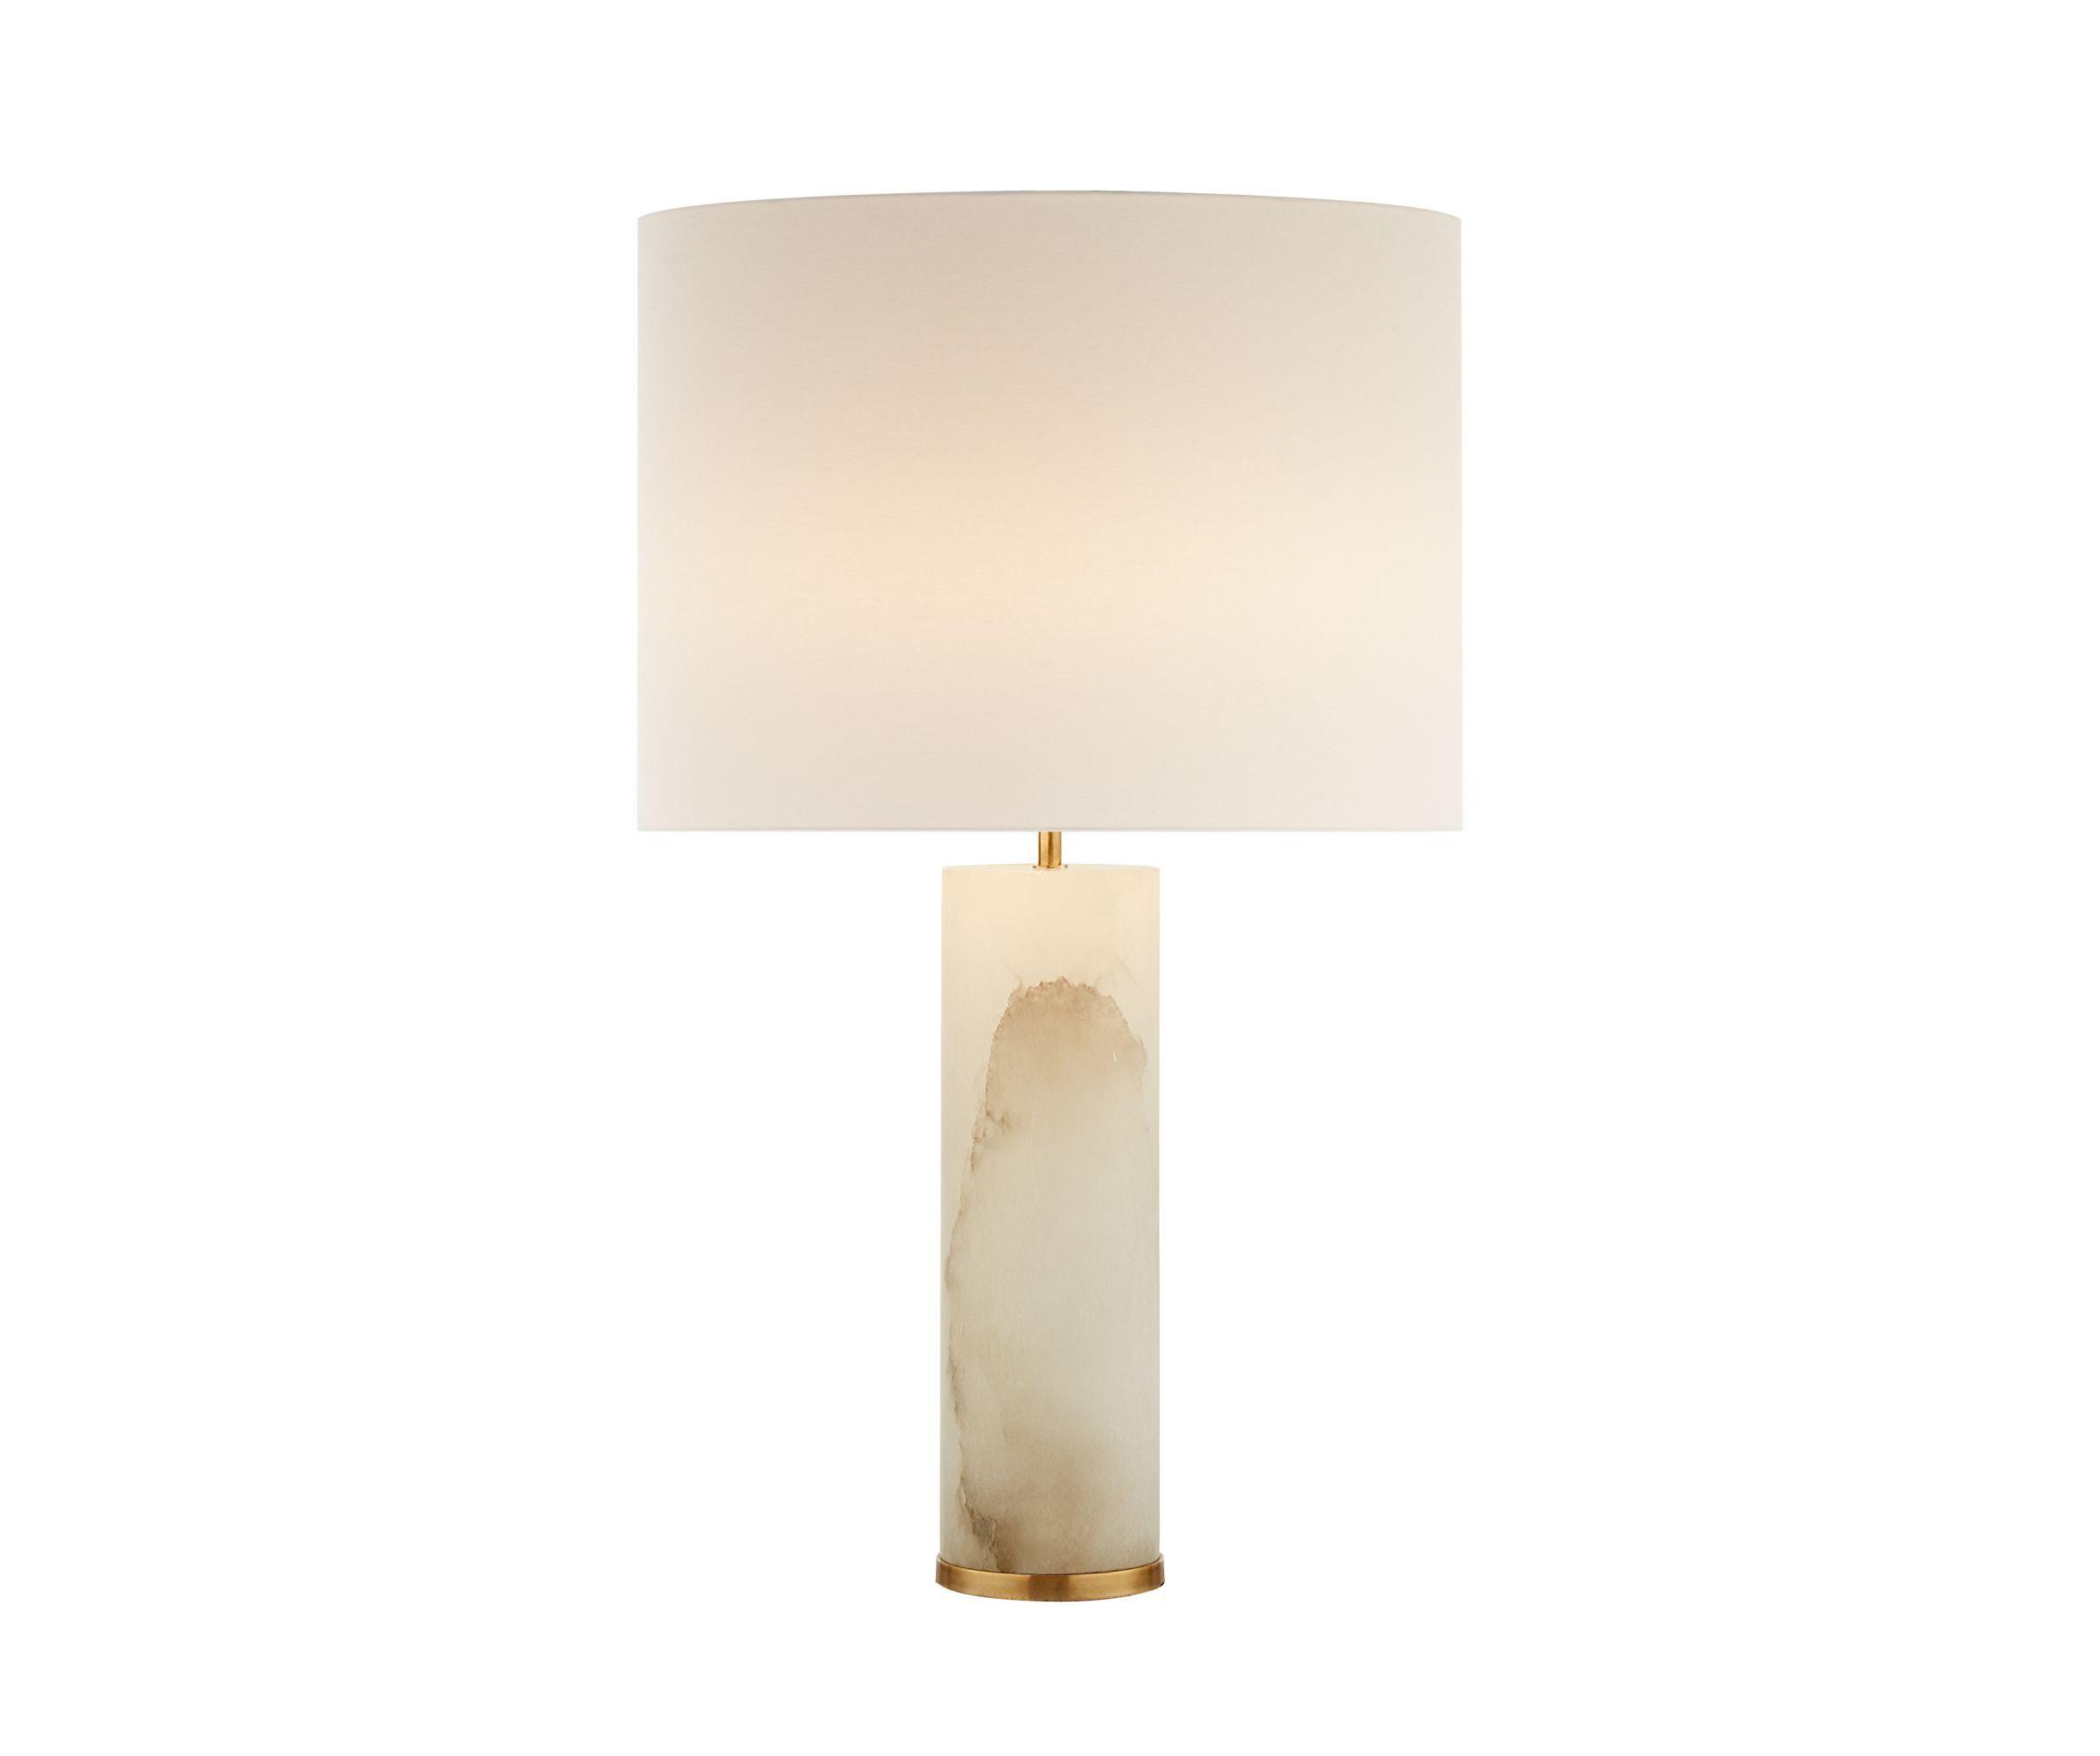 LINEHAM TABLE LAMP - Aerin